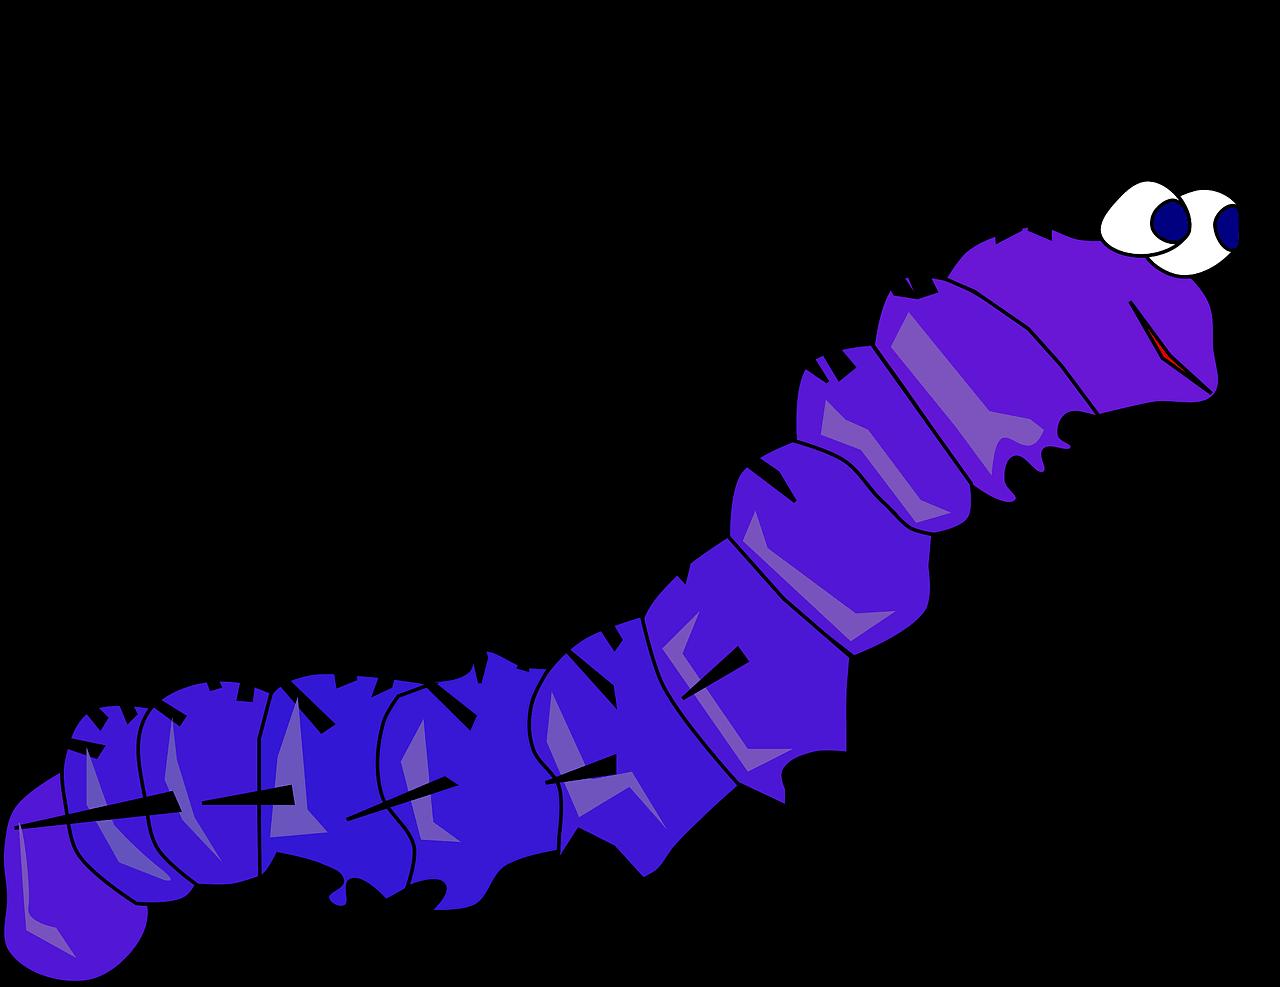 Caterpillar clipart transparent background 5